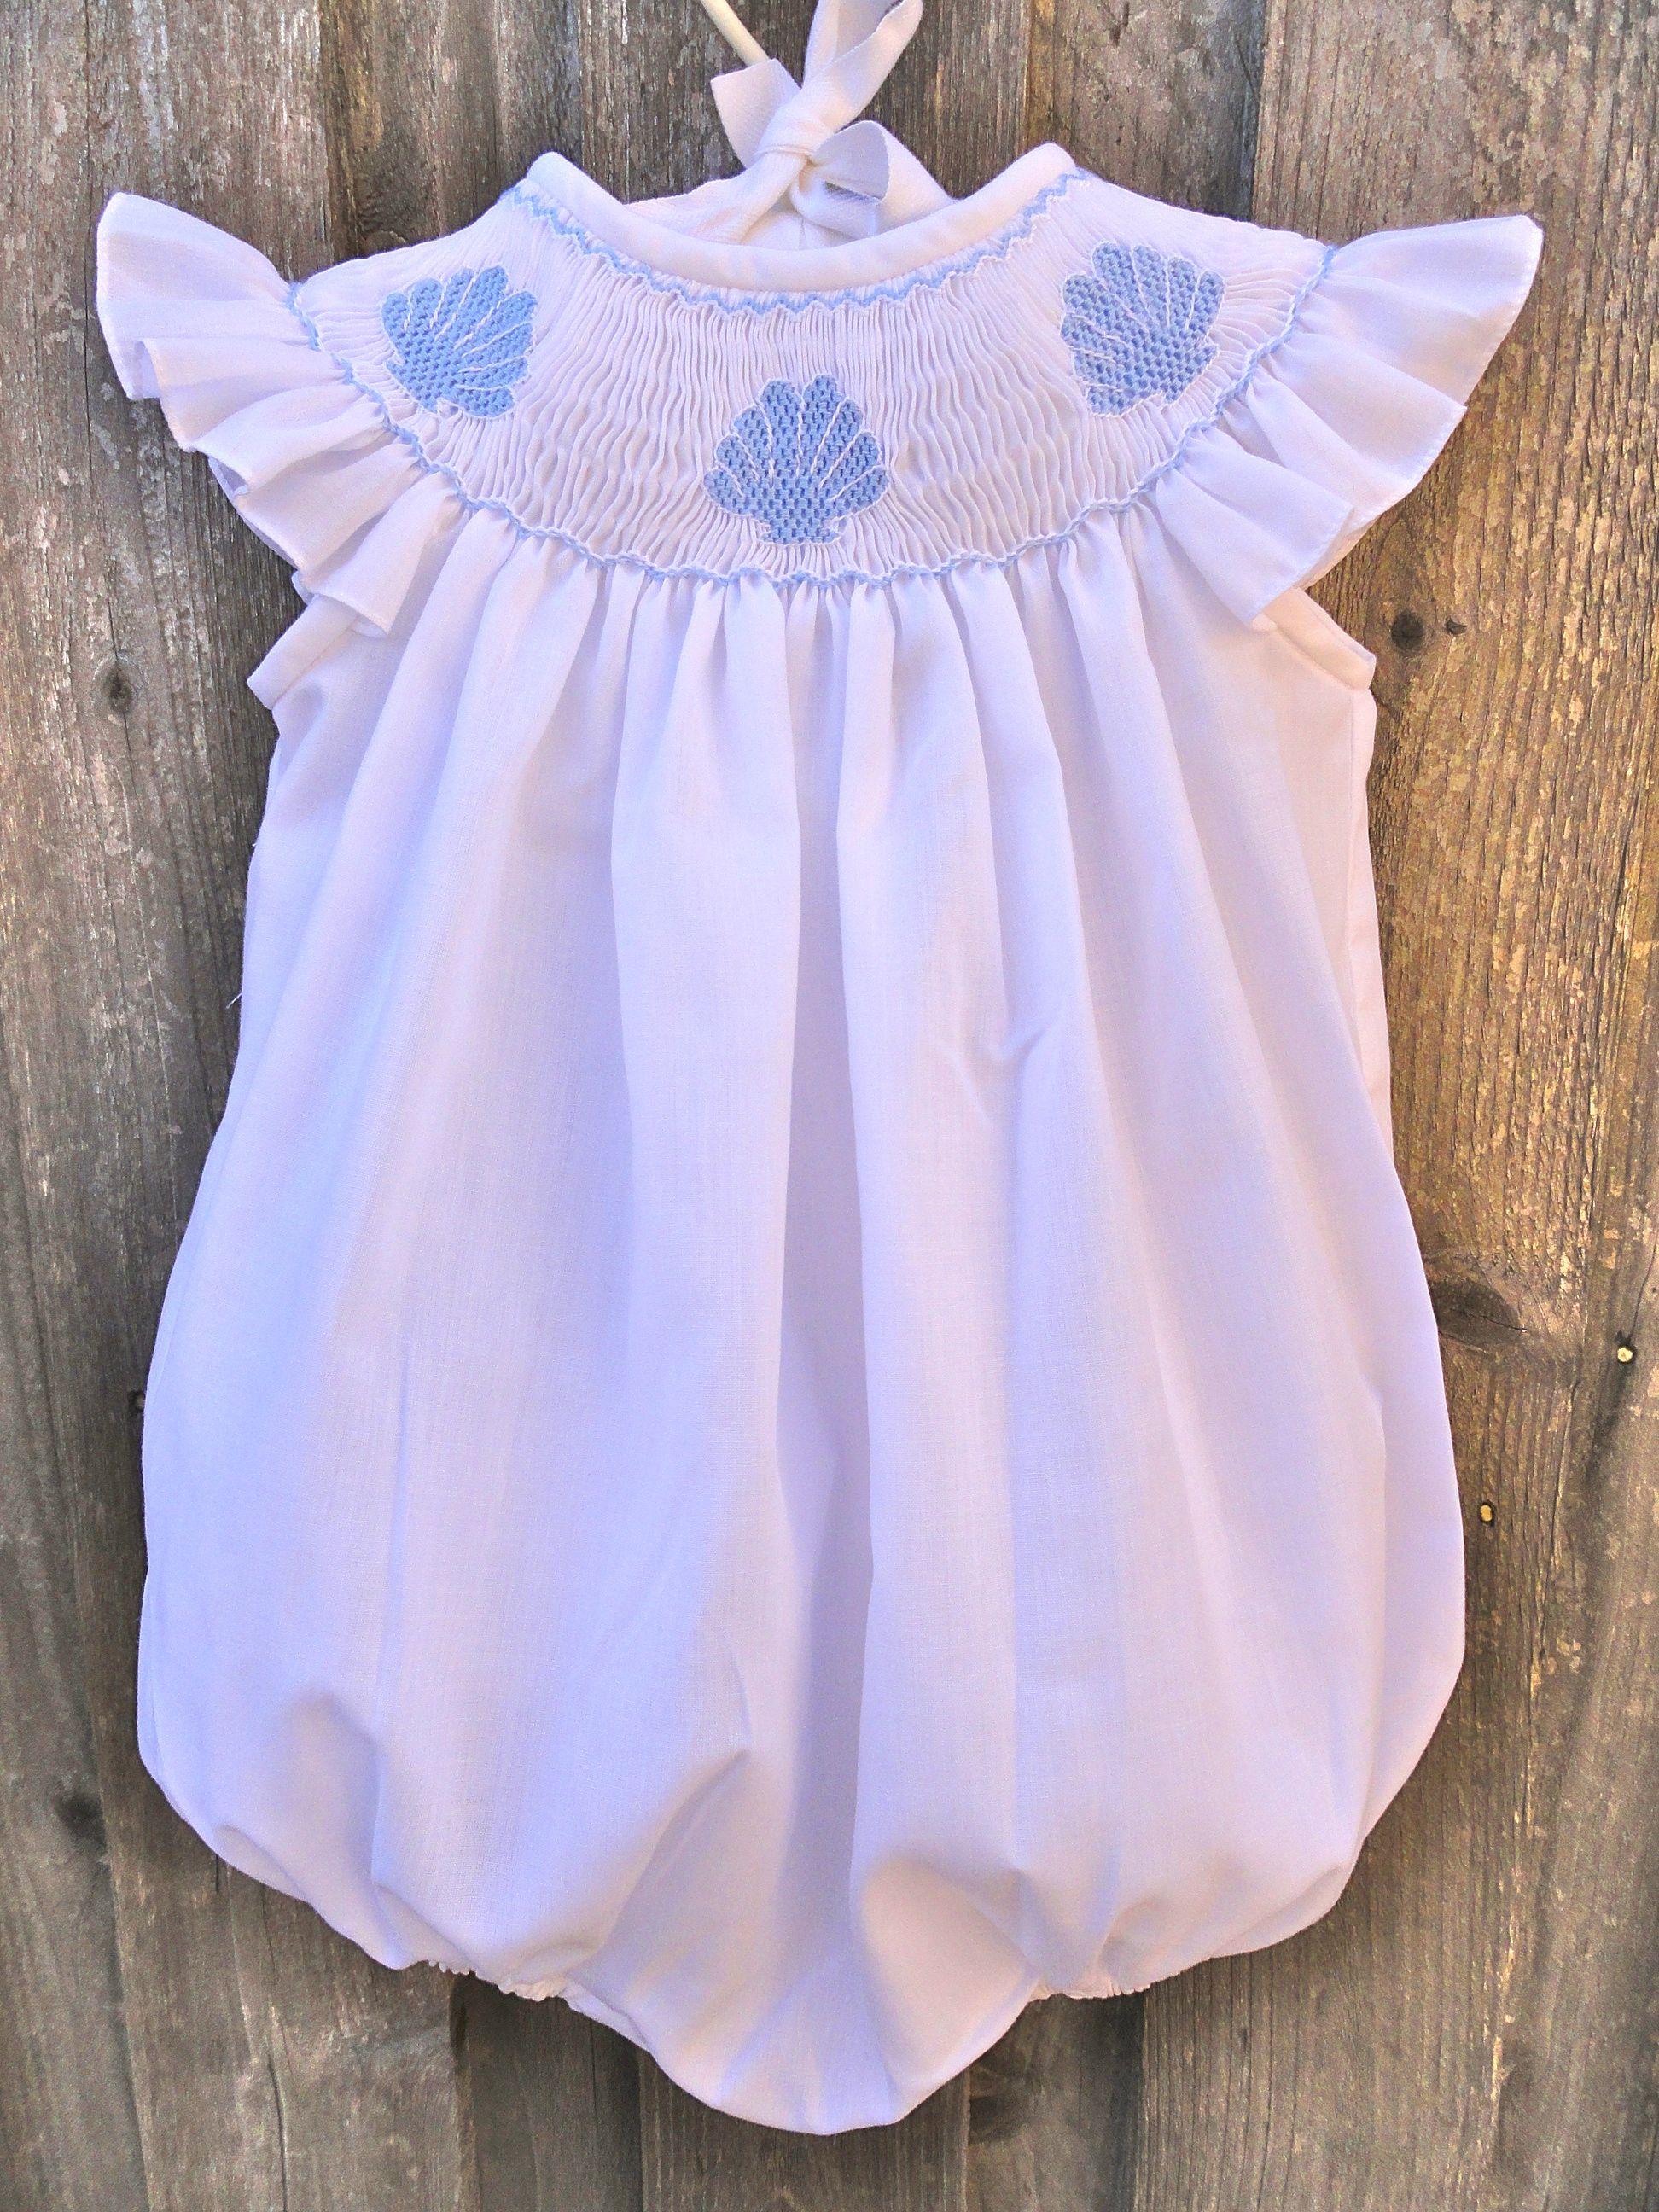 Smocked Seashell Dress